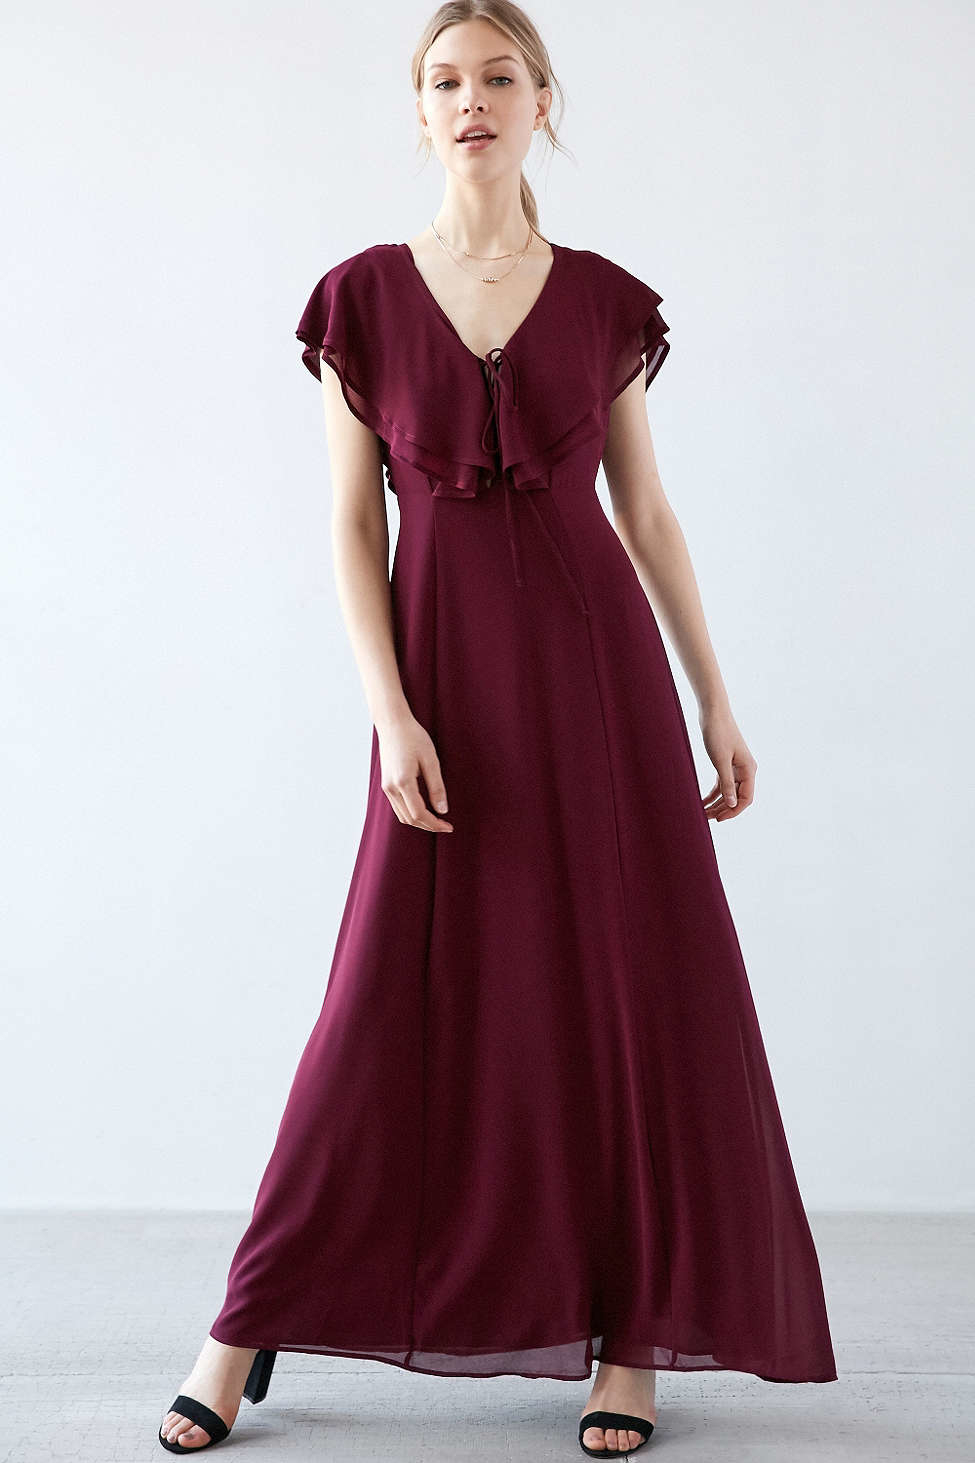 Lace flutter sleeve dress